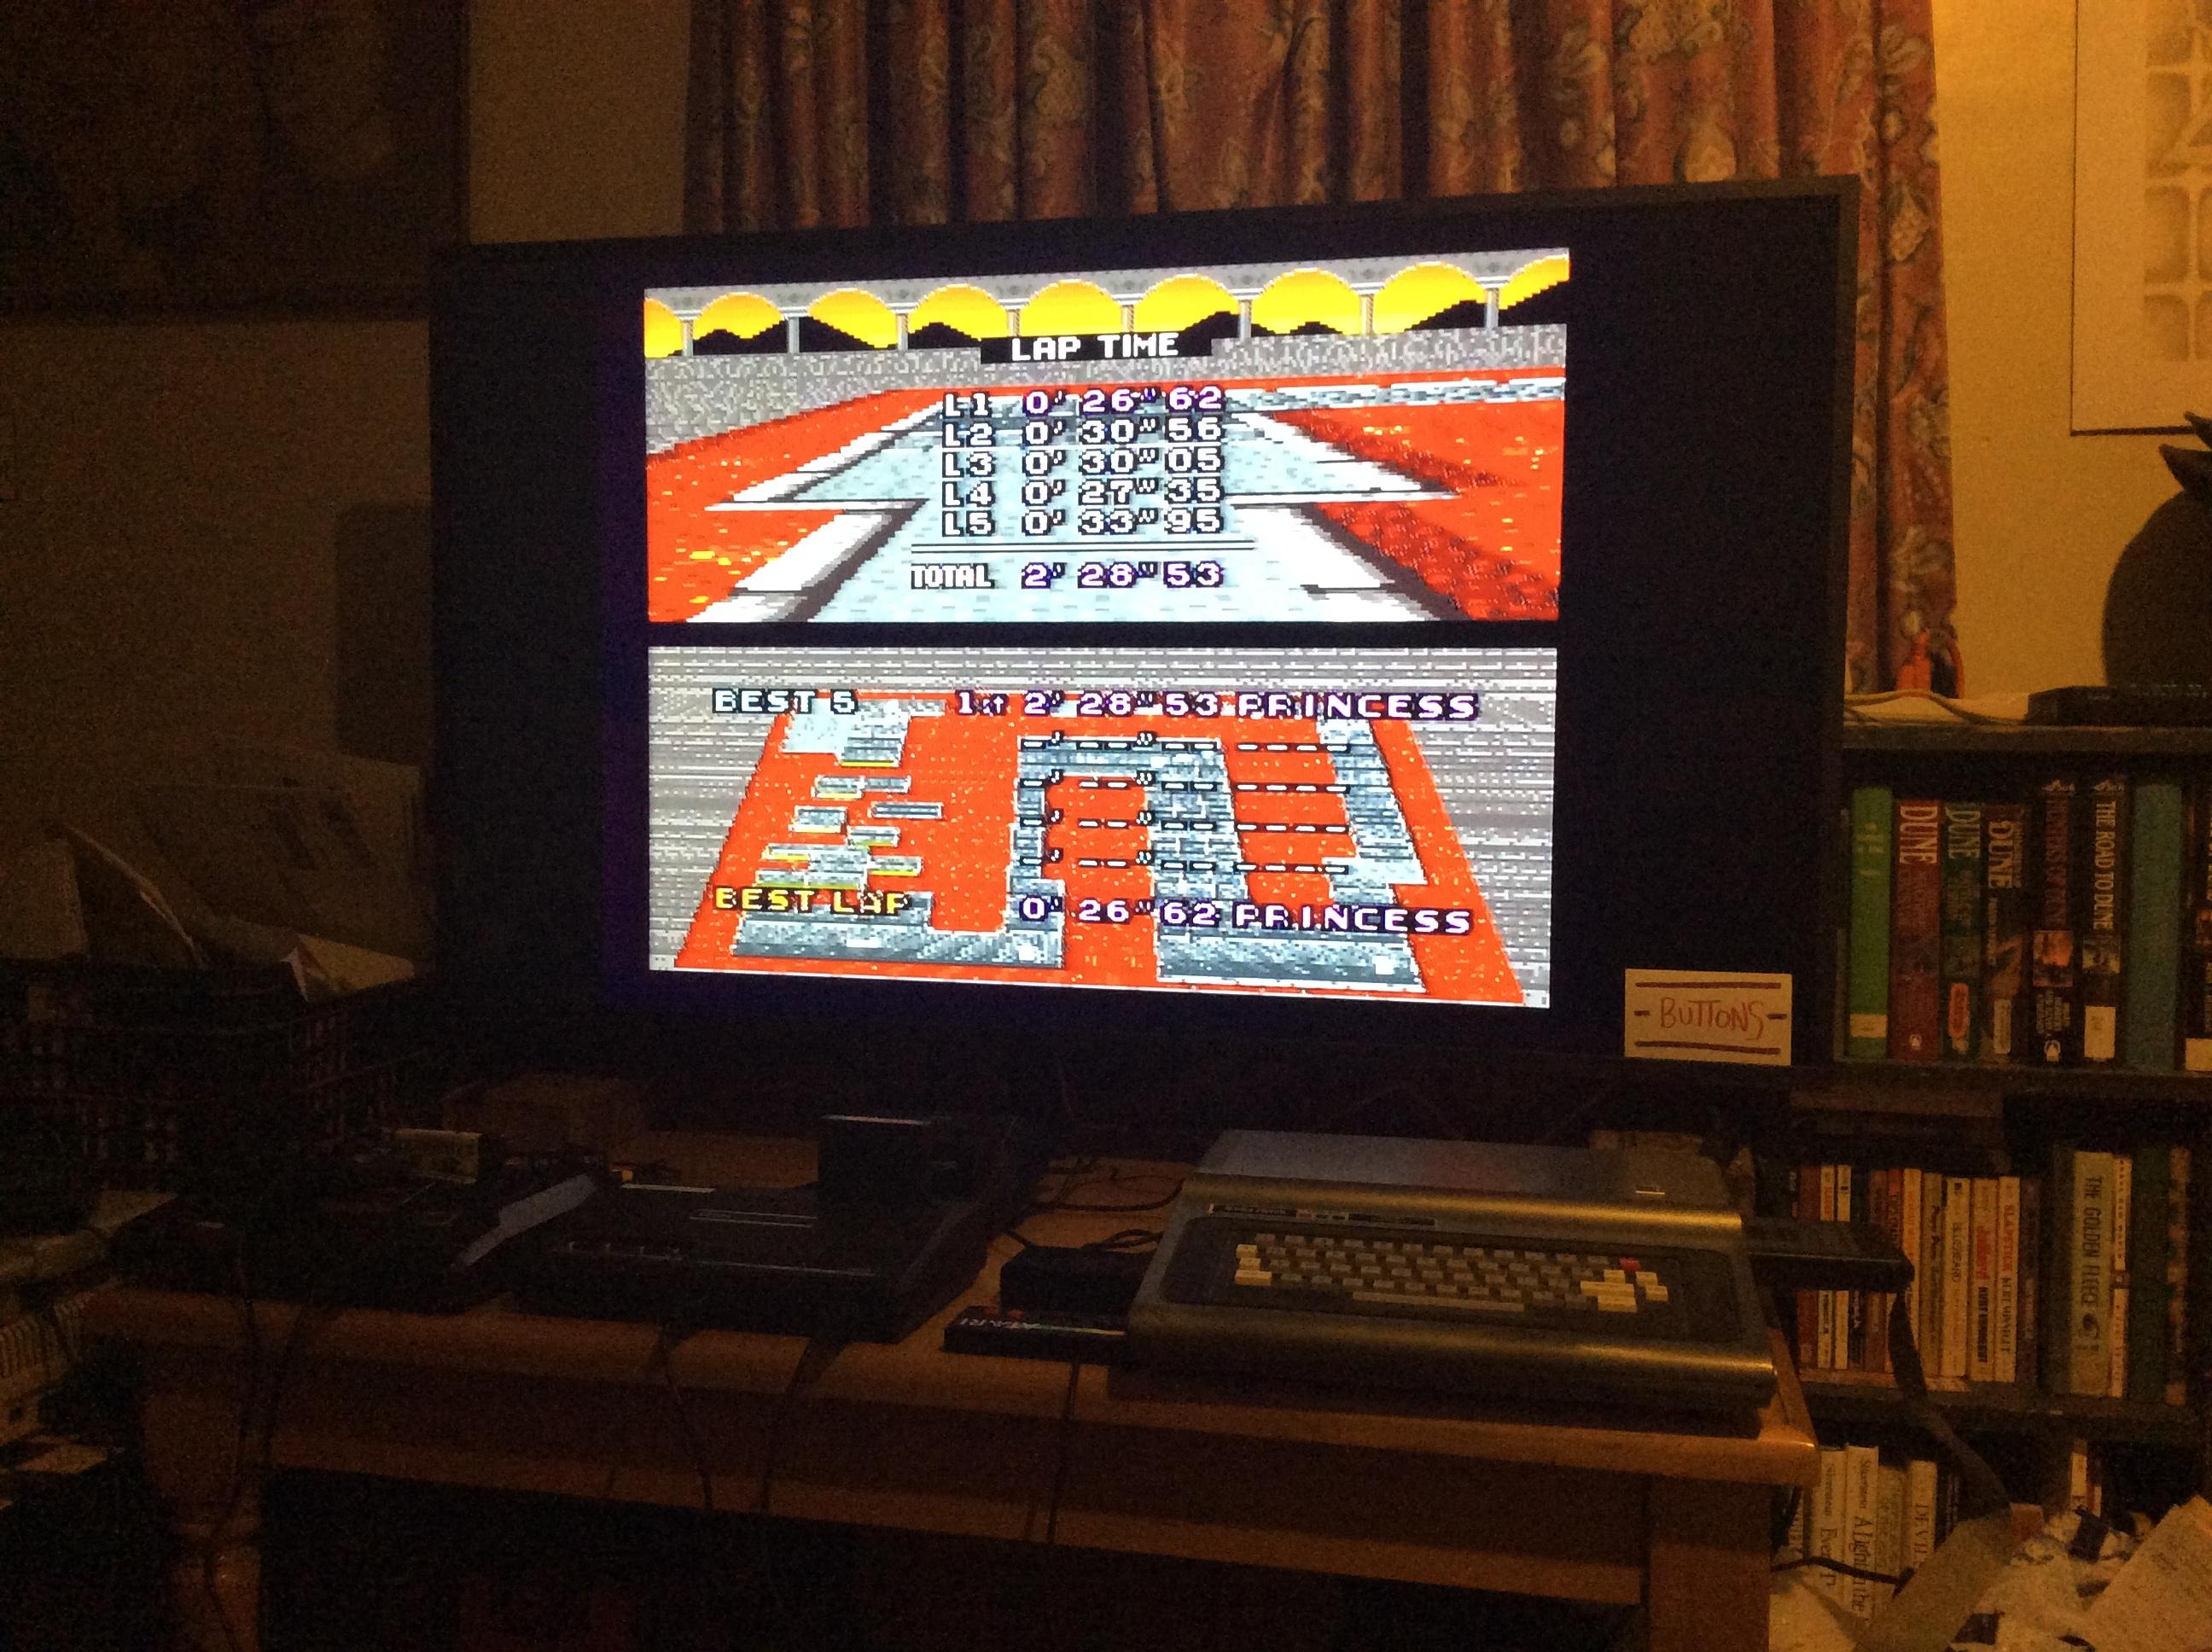 Super Mario Kart: Bowser Castle 3 [Time Trial] time of 0:02:28.53